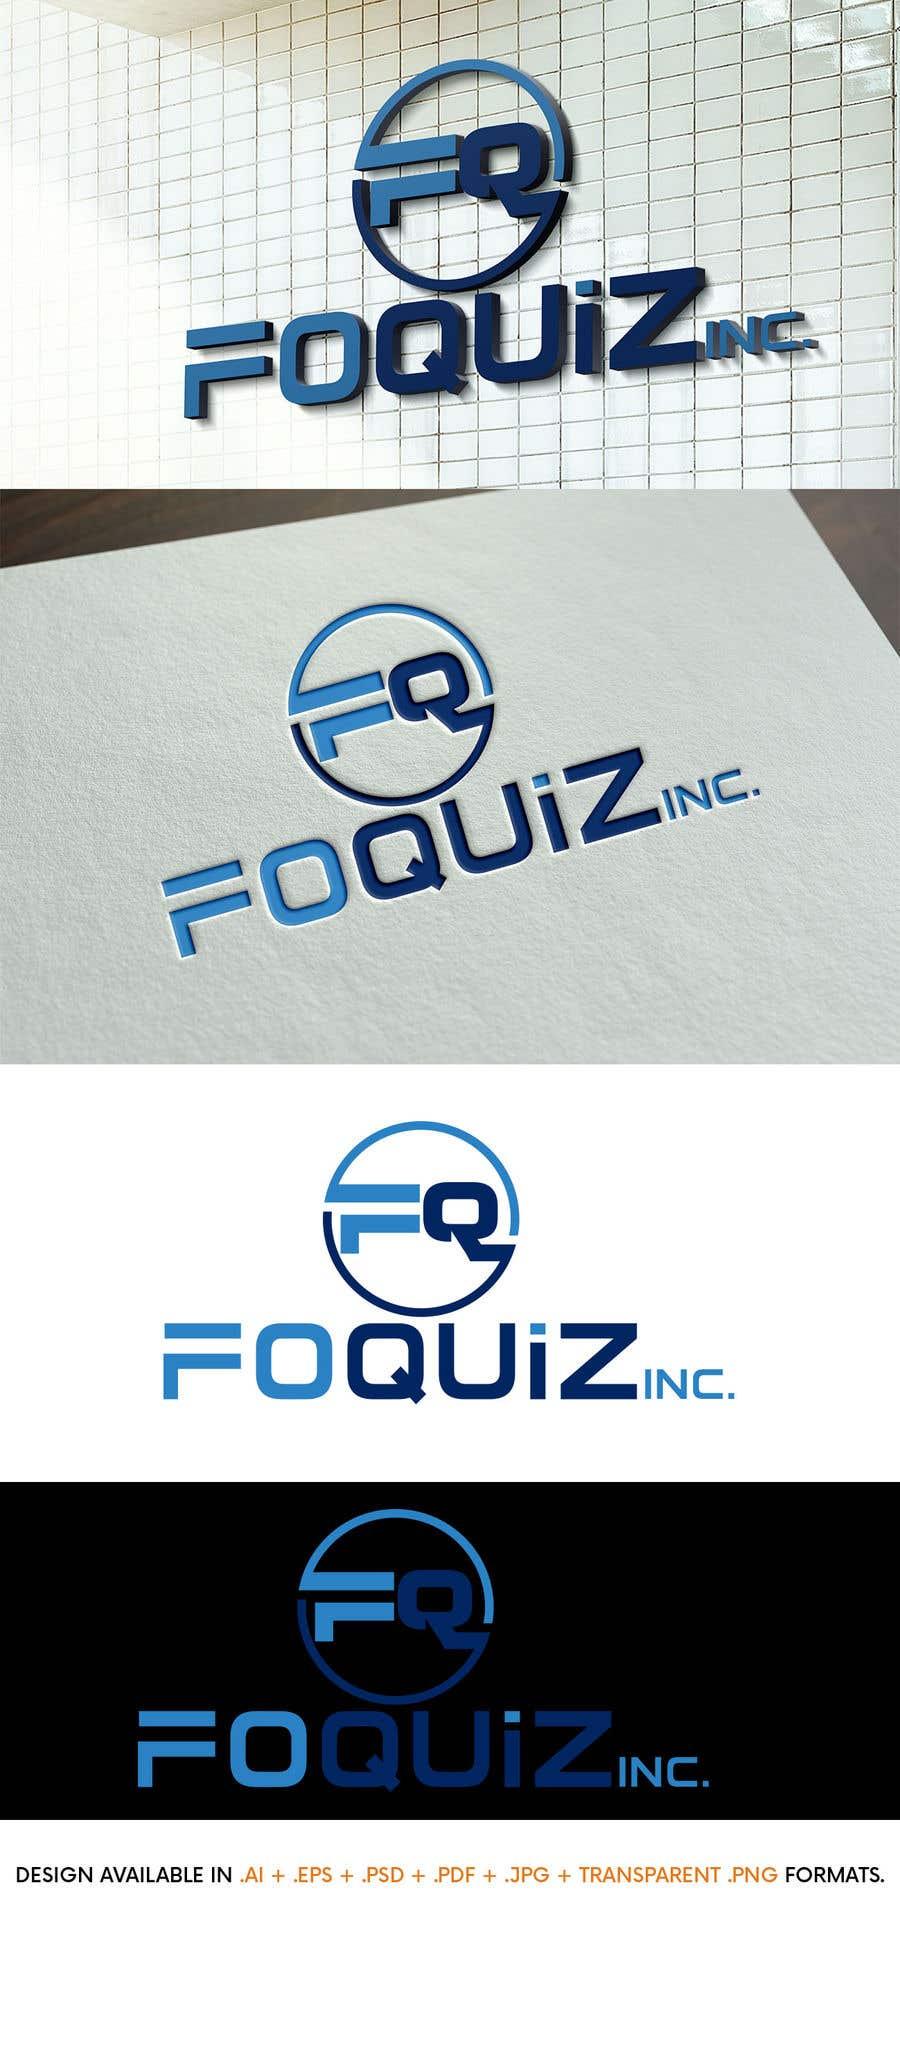 Entry 5 By Johndigitech For Design A Logo Foquiz Inc Freelancer